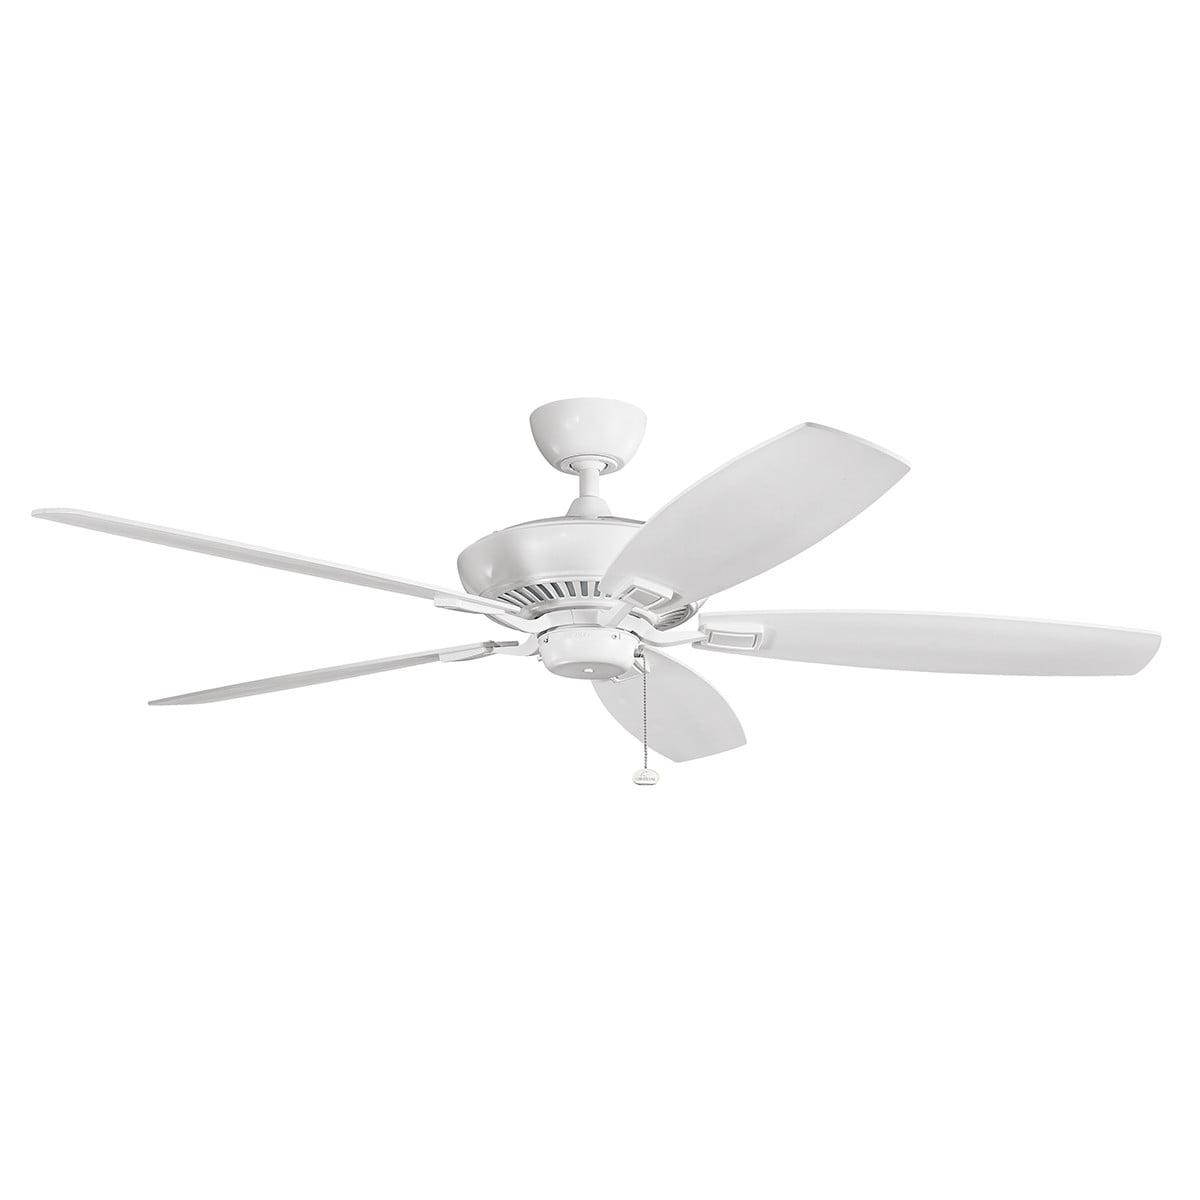 Kichler 300188 60 Canfield Xl Indoor Ceiling Fan Walmart Com Walmart Com